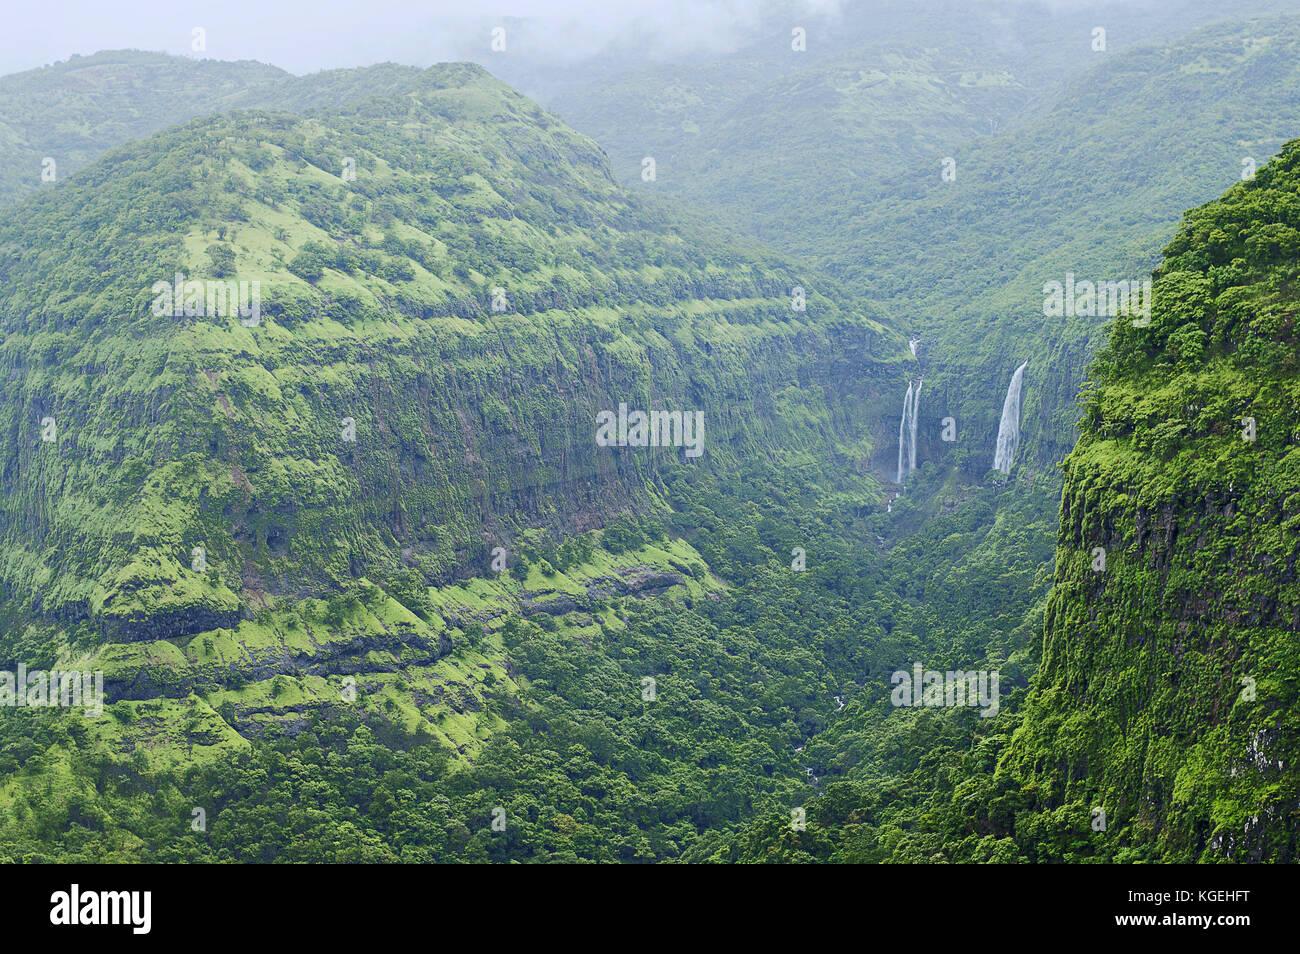 Le montagne con cascate in varandha ghat di Pune, Maharashtra Foto Stock